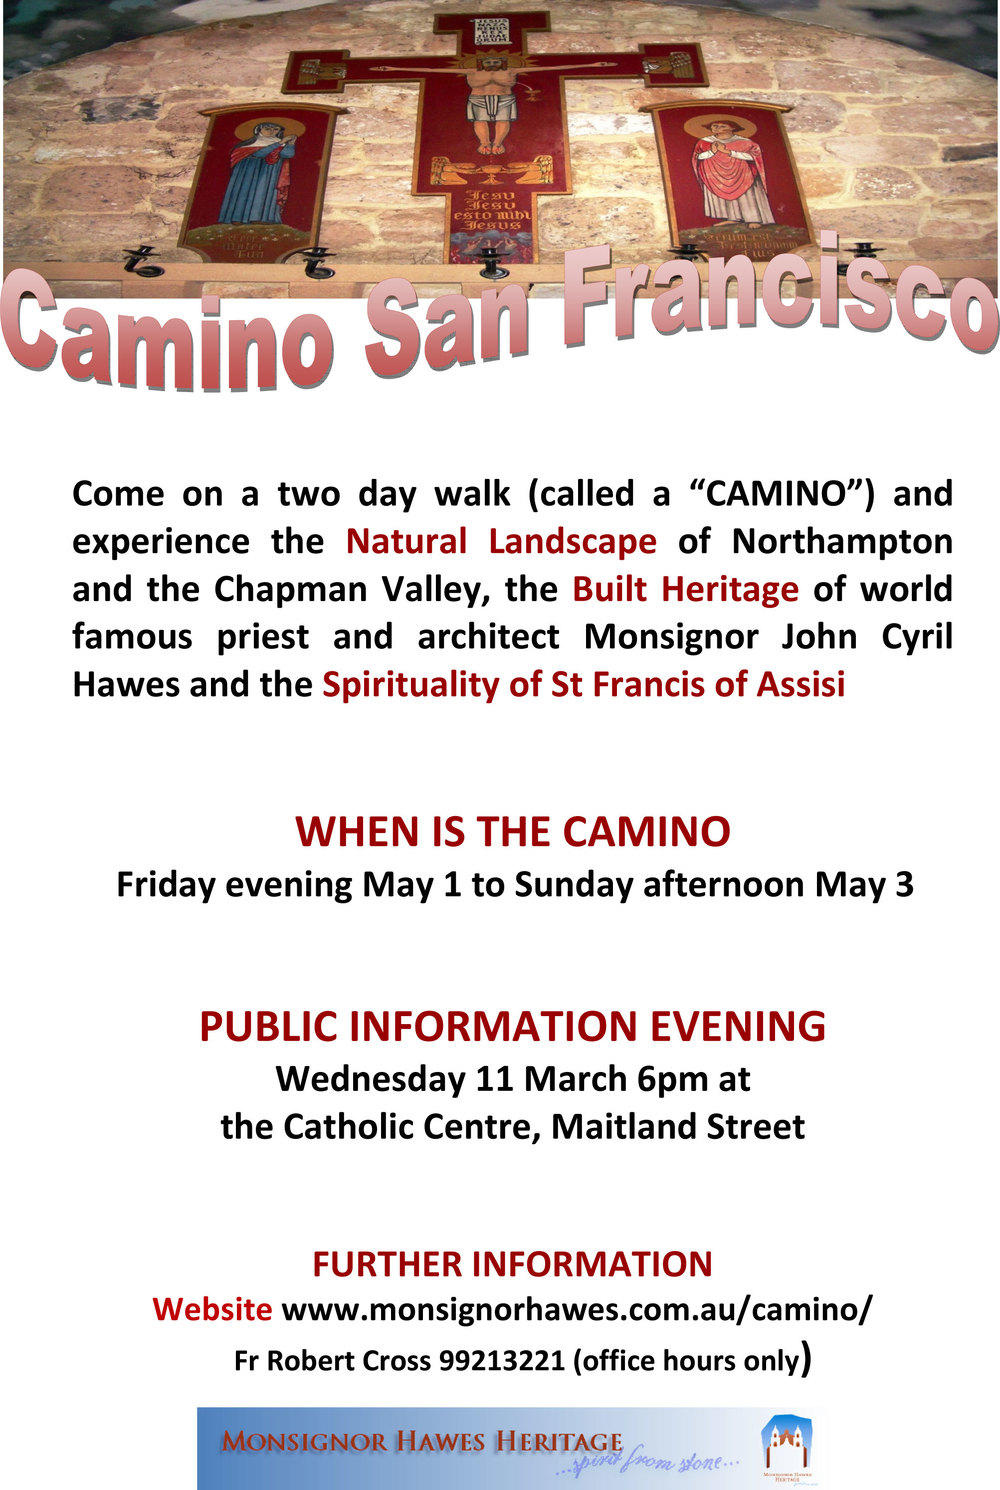 Camino-Advertising-Banner.jpg